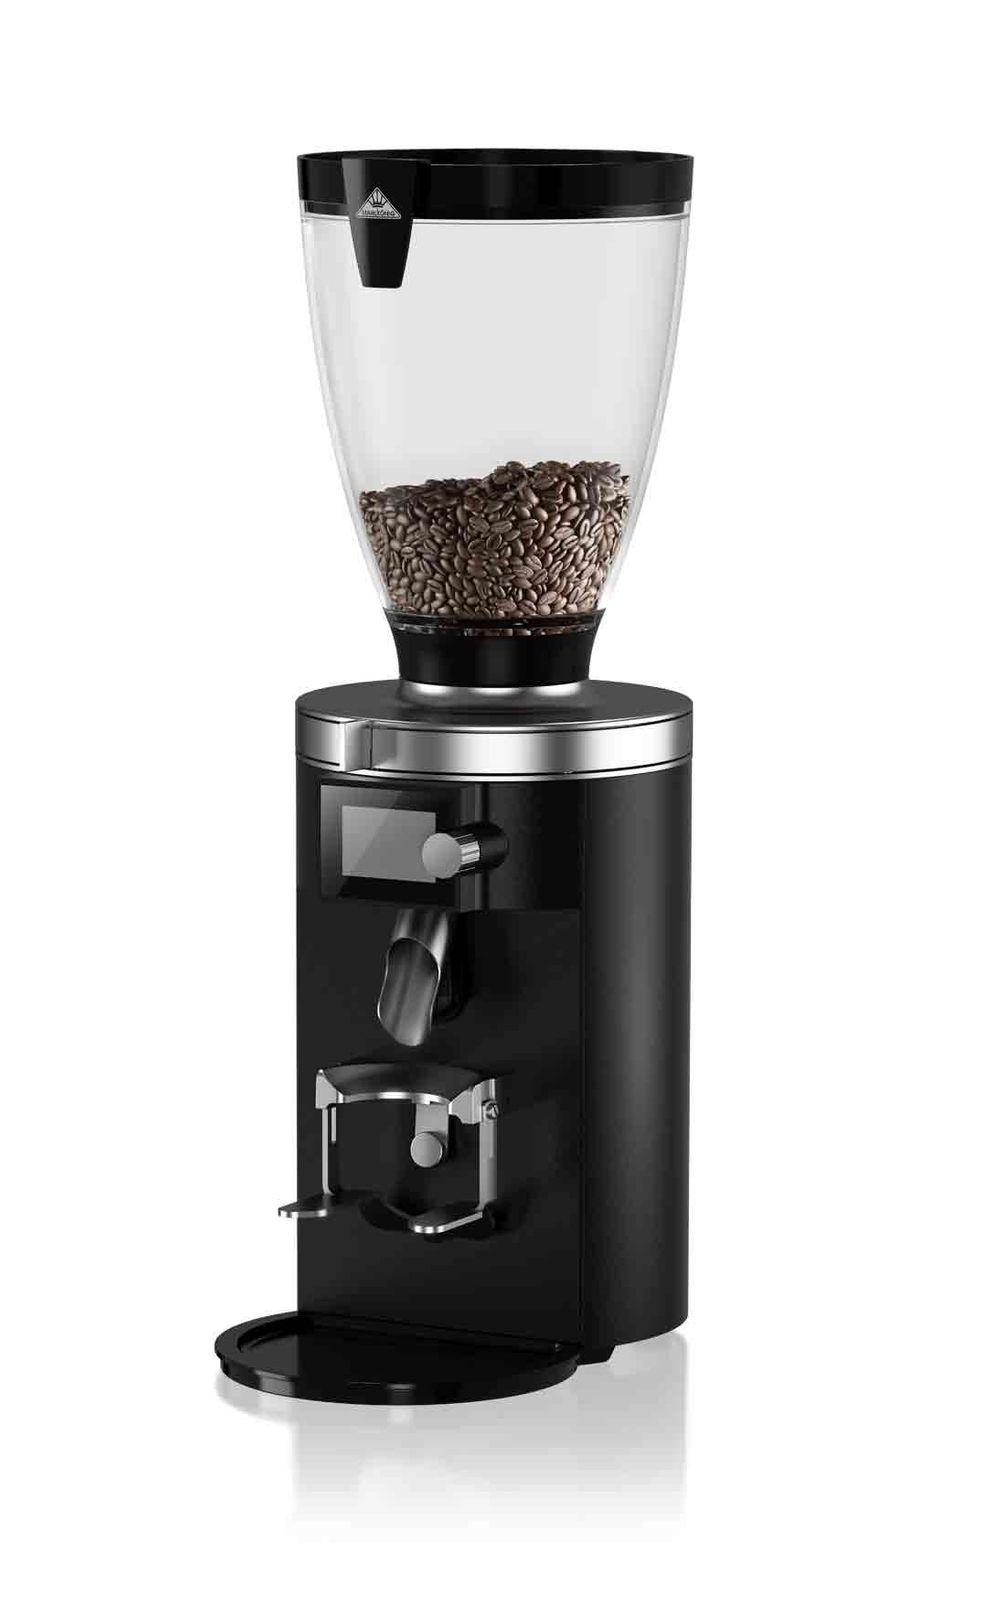 Mahlkönig E65S Espressomühle für Kaffeebohnen, Kaffeemühle